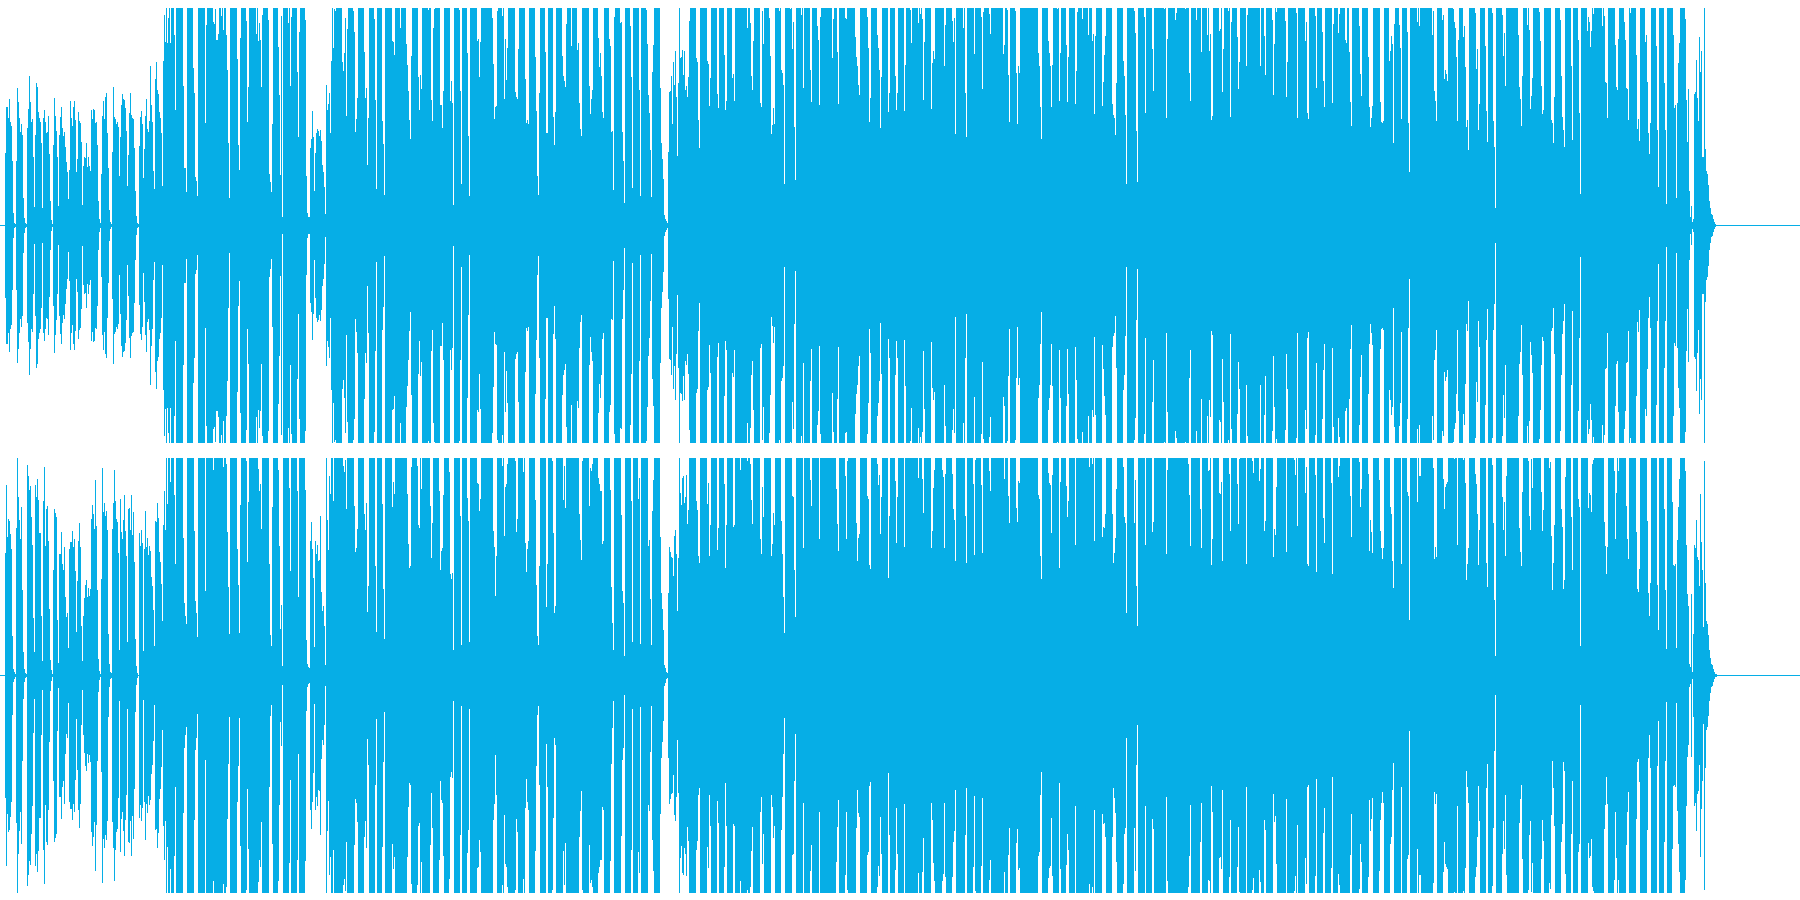 EDM 一風変わったプロモーションBGMの再生済みの波形